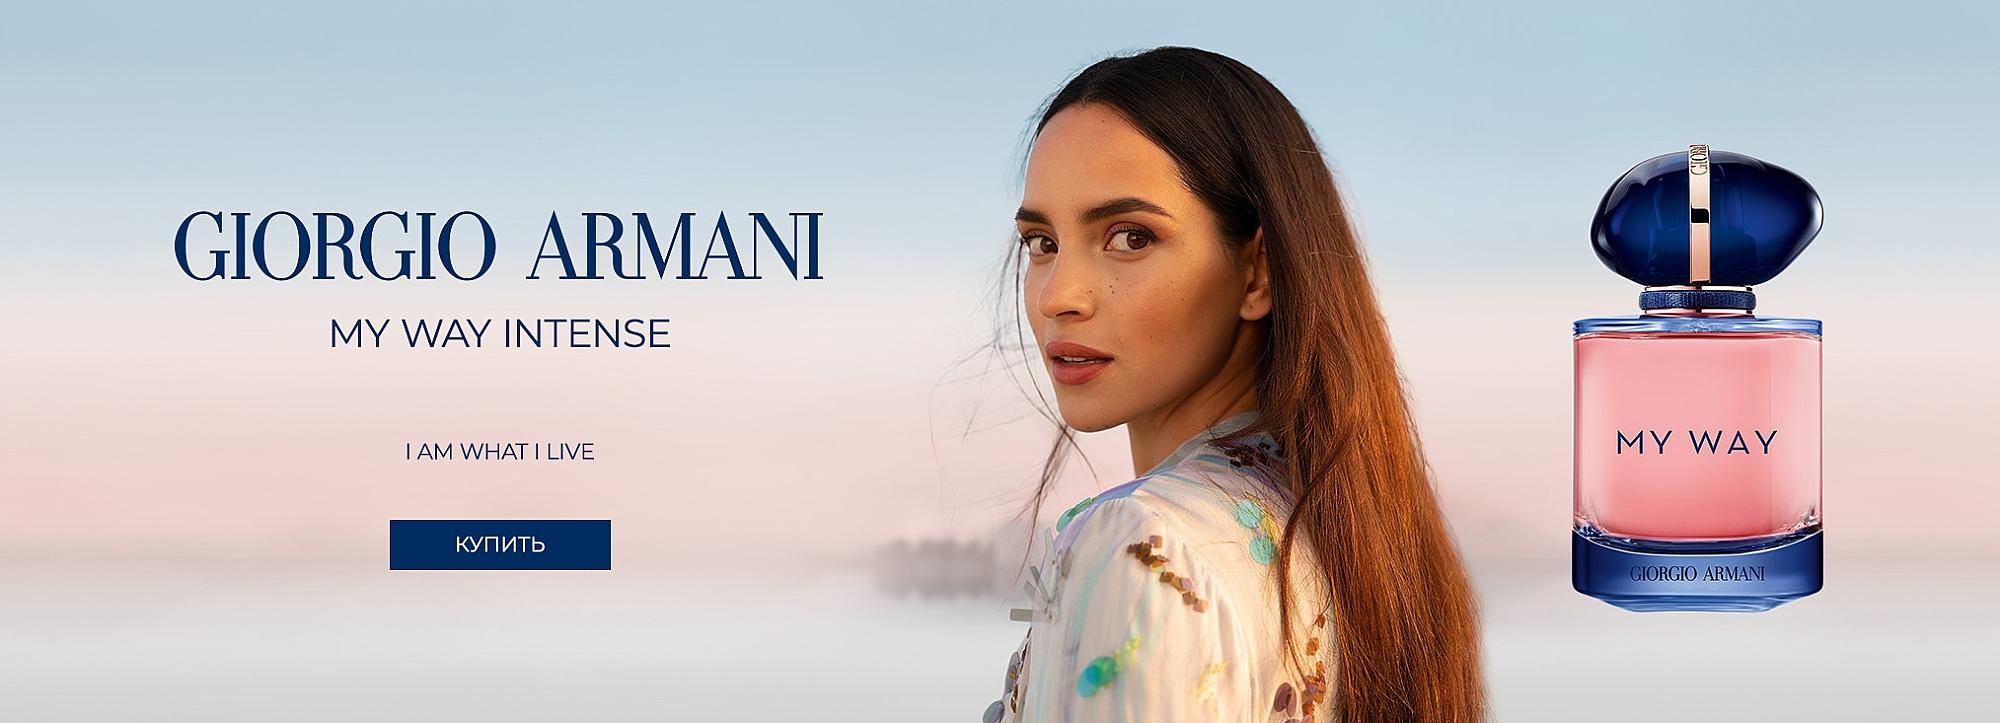 Giorgio Armani My Way29588